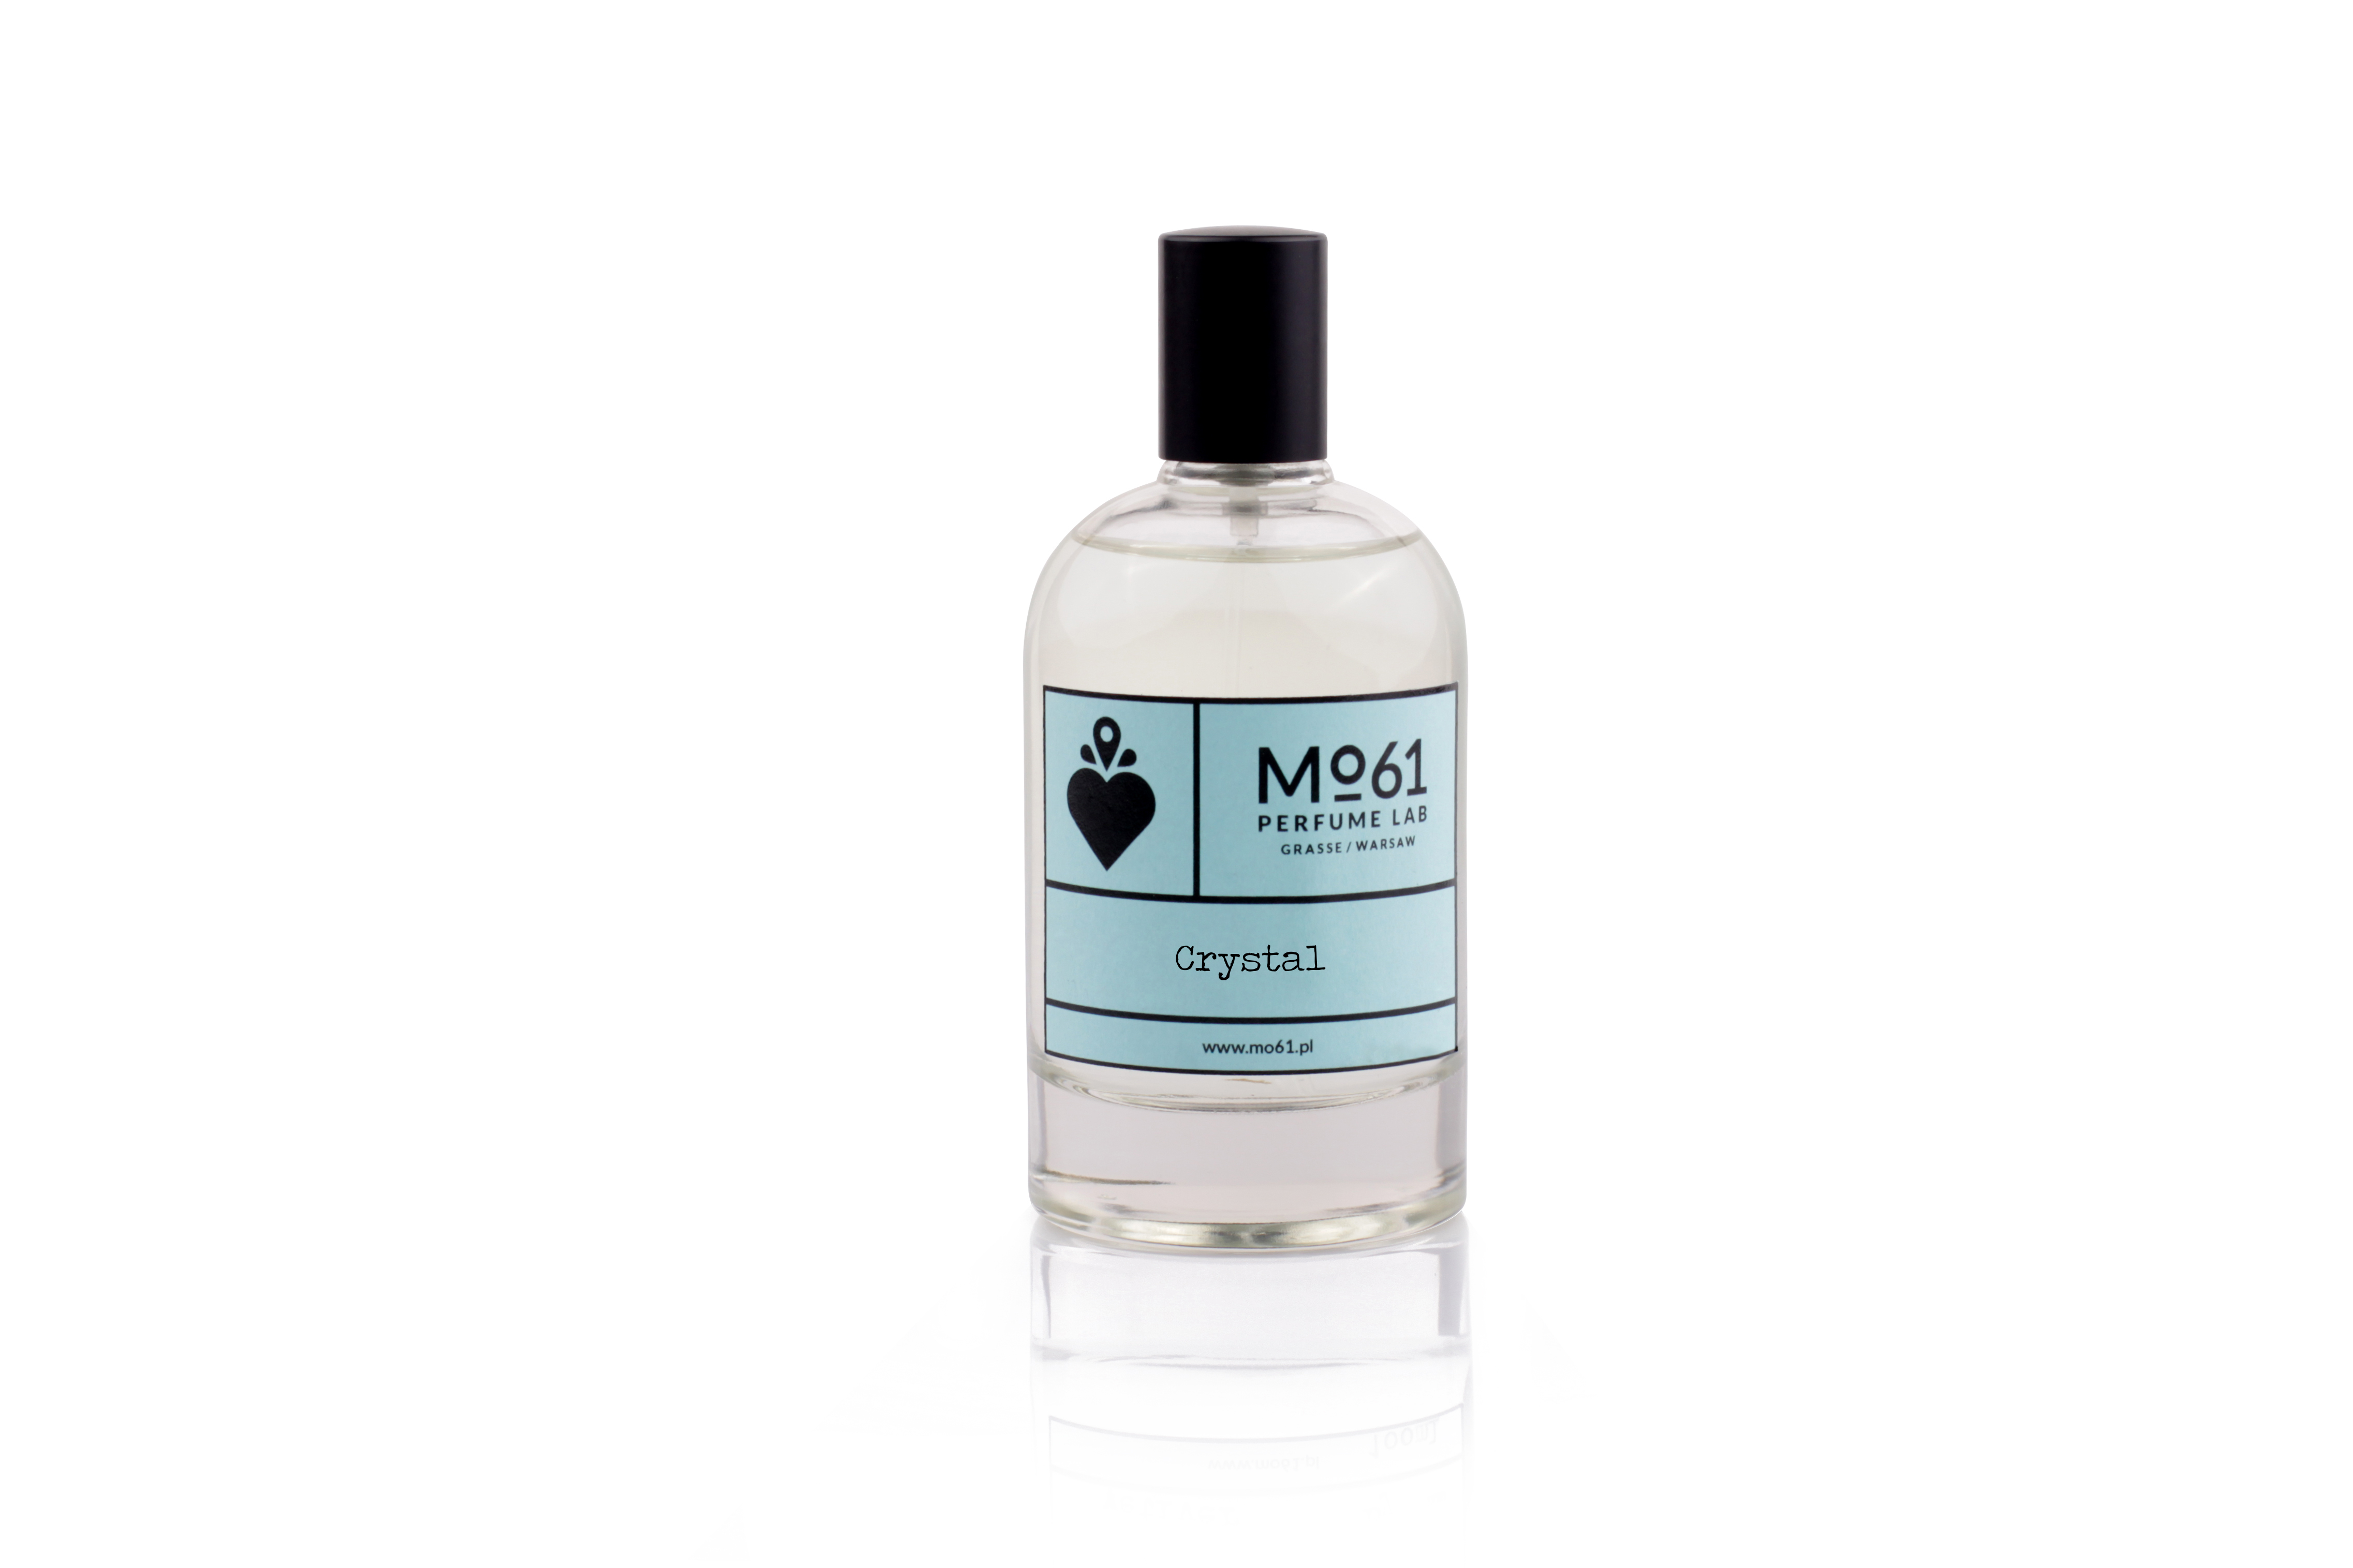 740a1349ac7430 Mo61 Perfume Lab | Voucher upominkowy (druk)